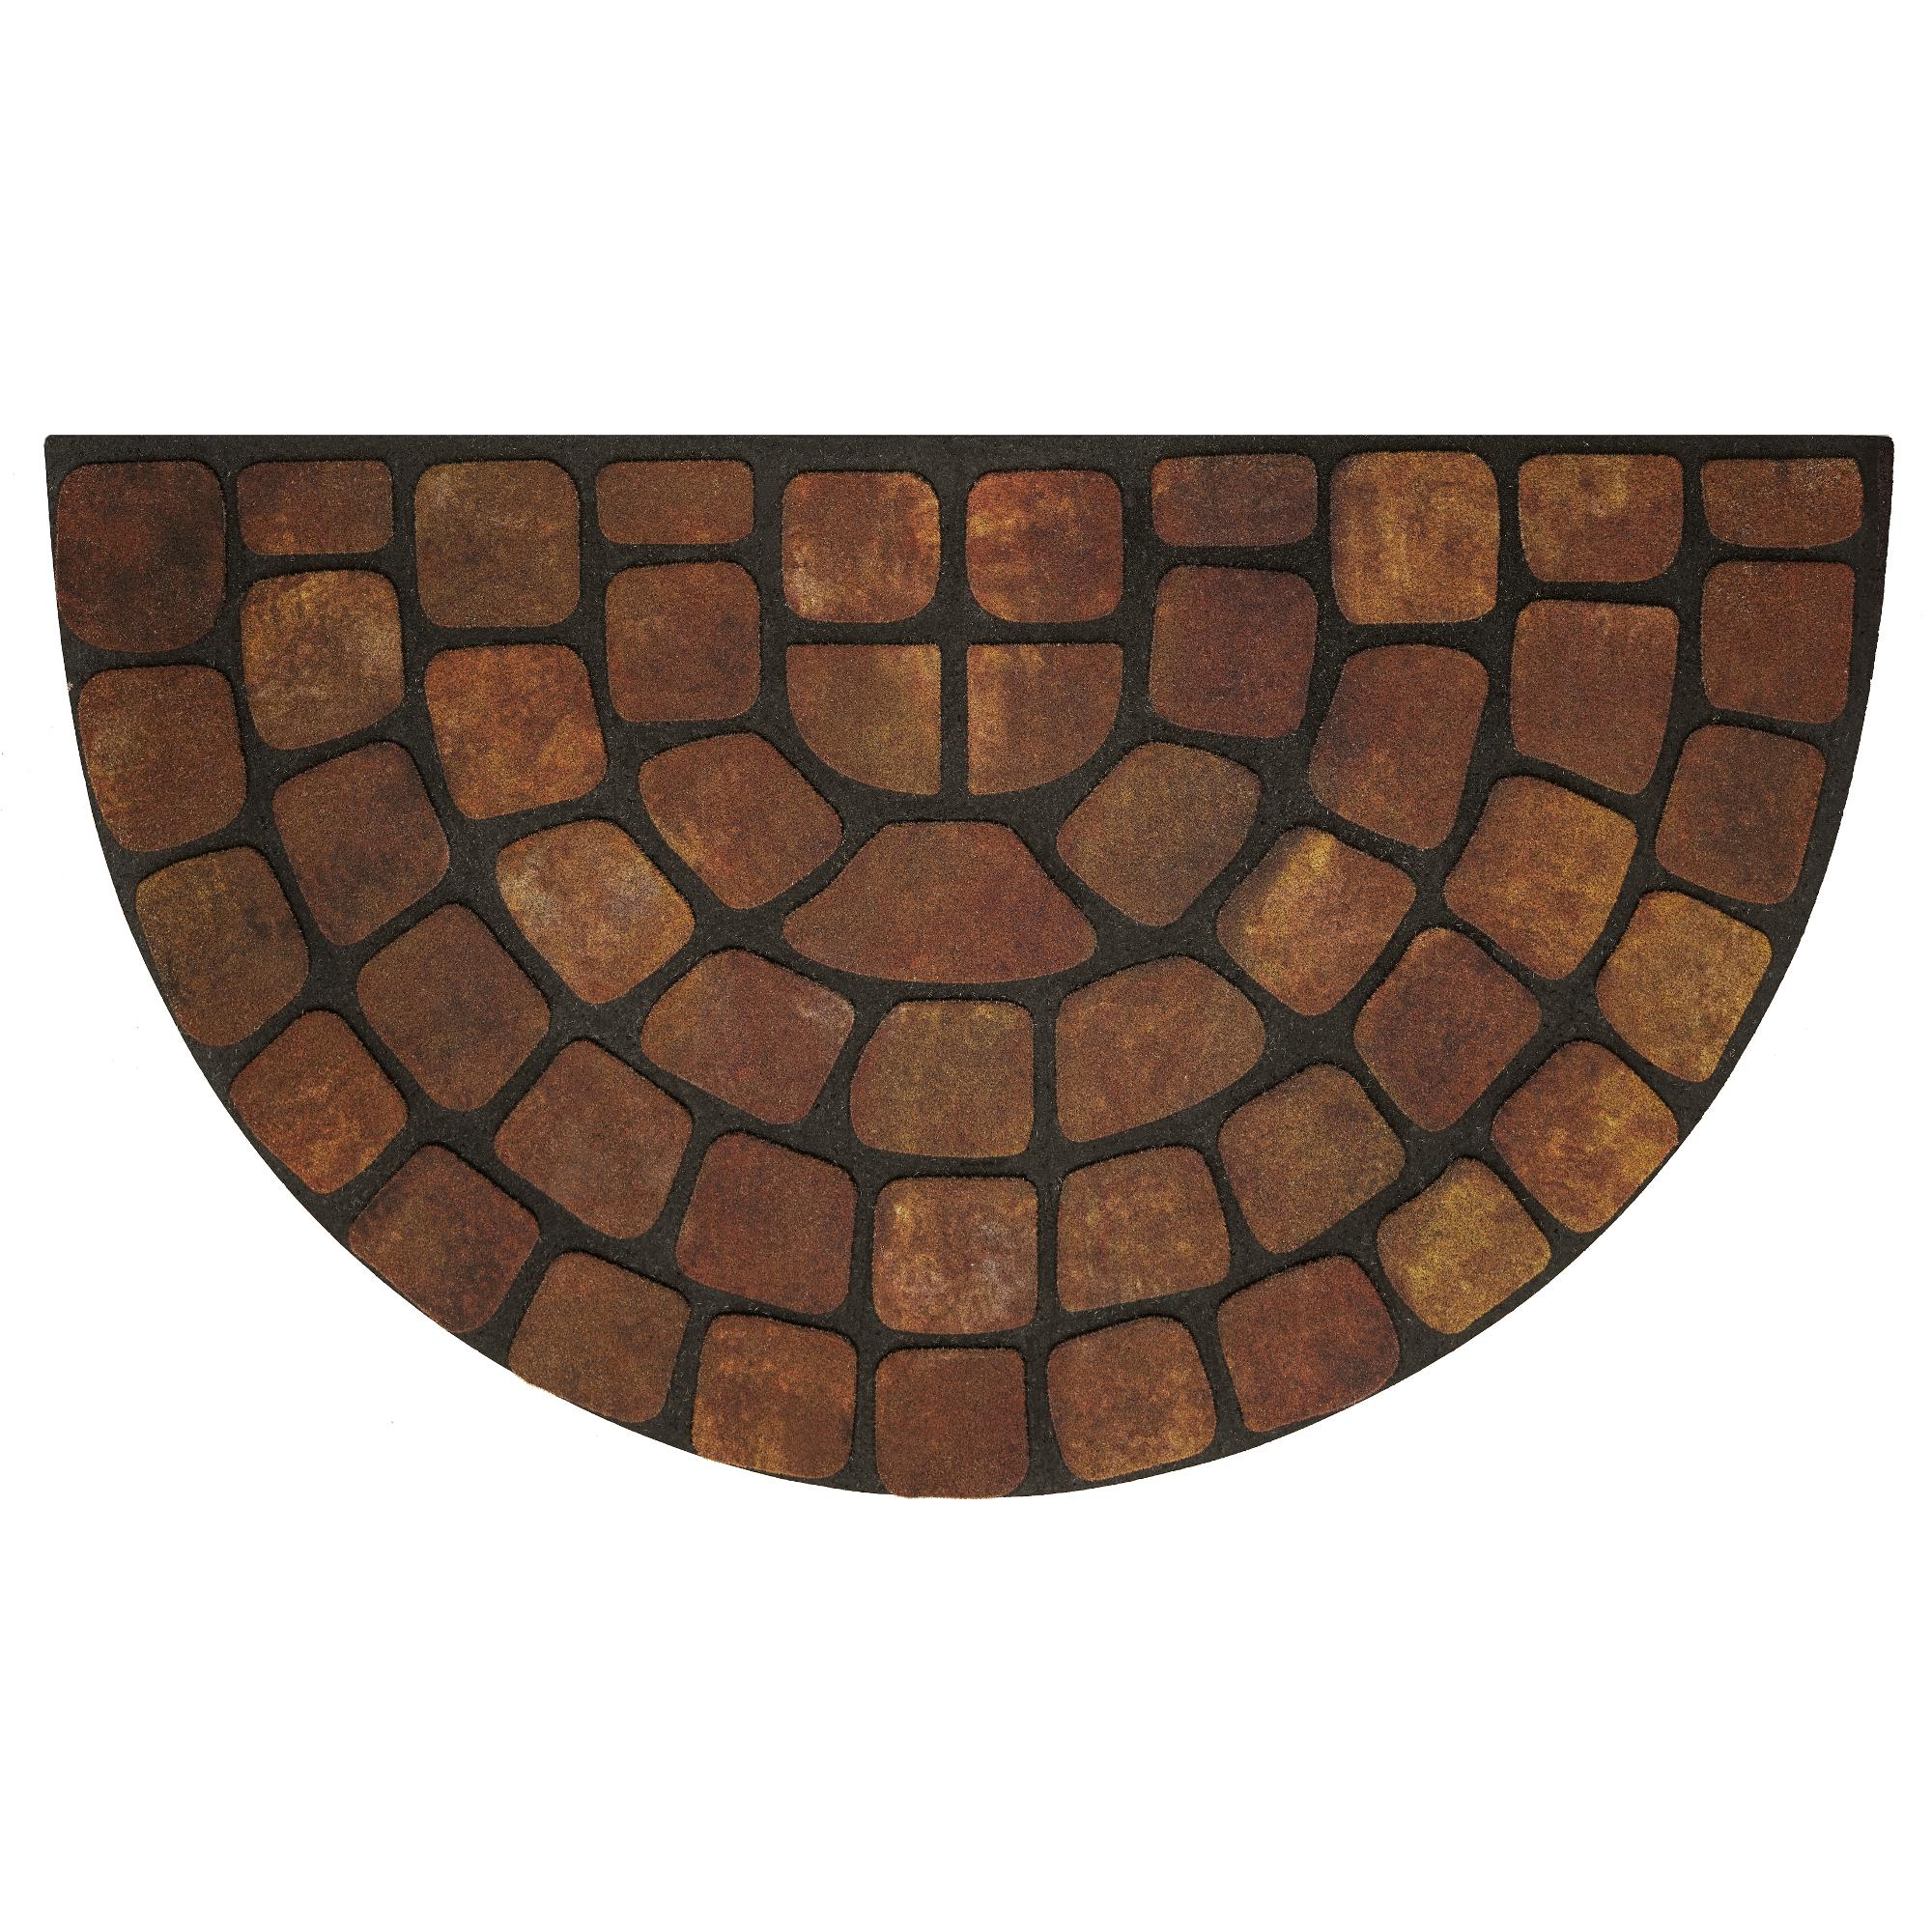 Image of Achim Raised Rubber Mat Beige Stone Slice 18x30, Beige & Tan